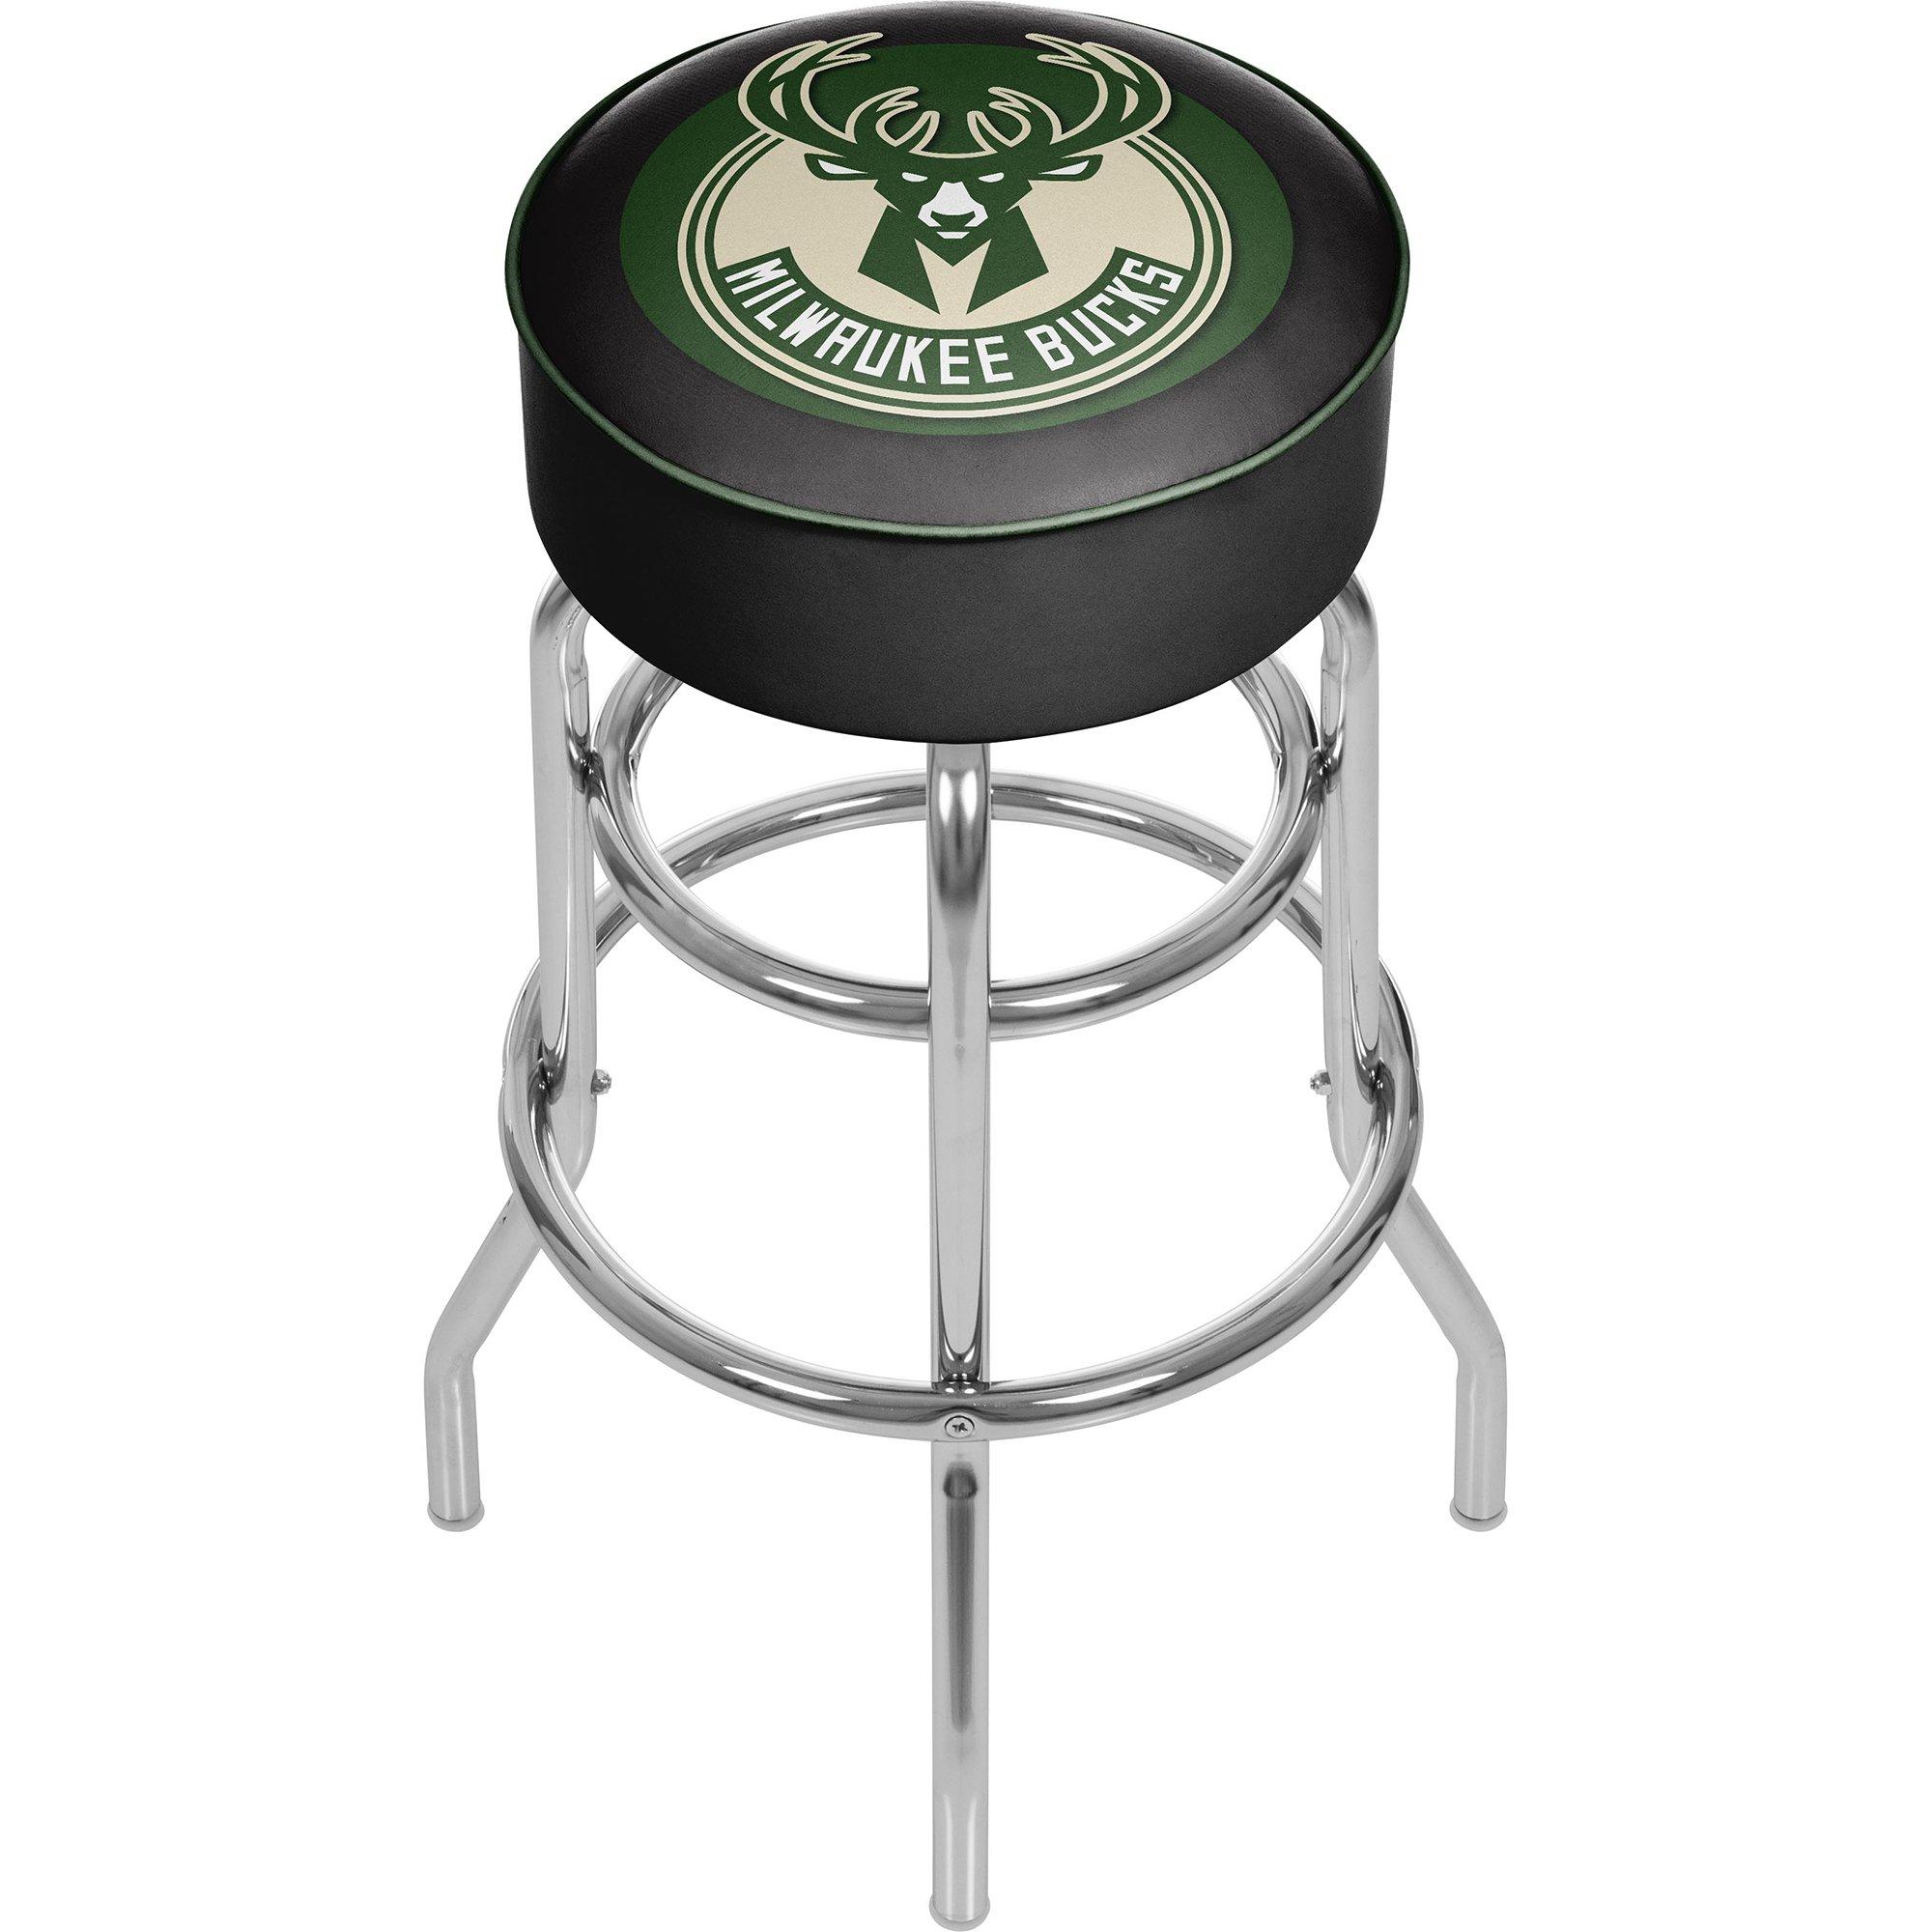 Trademark Gameroom NBA Milwaukee Bucks Padded Swivel Bar Stool